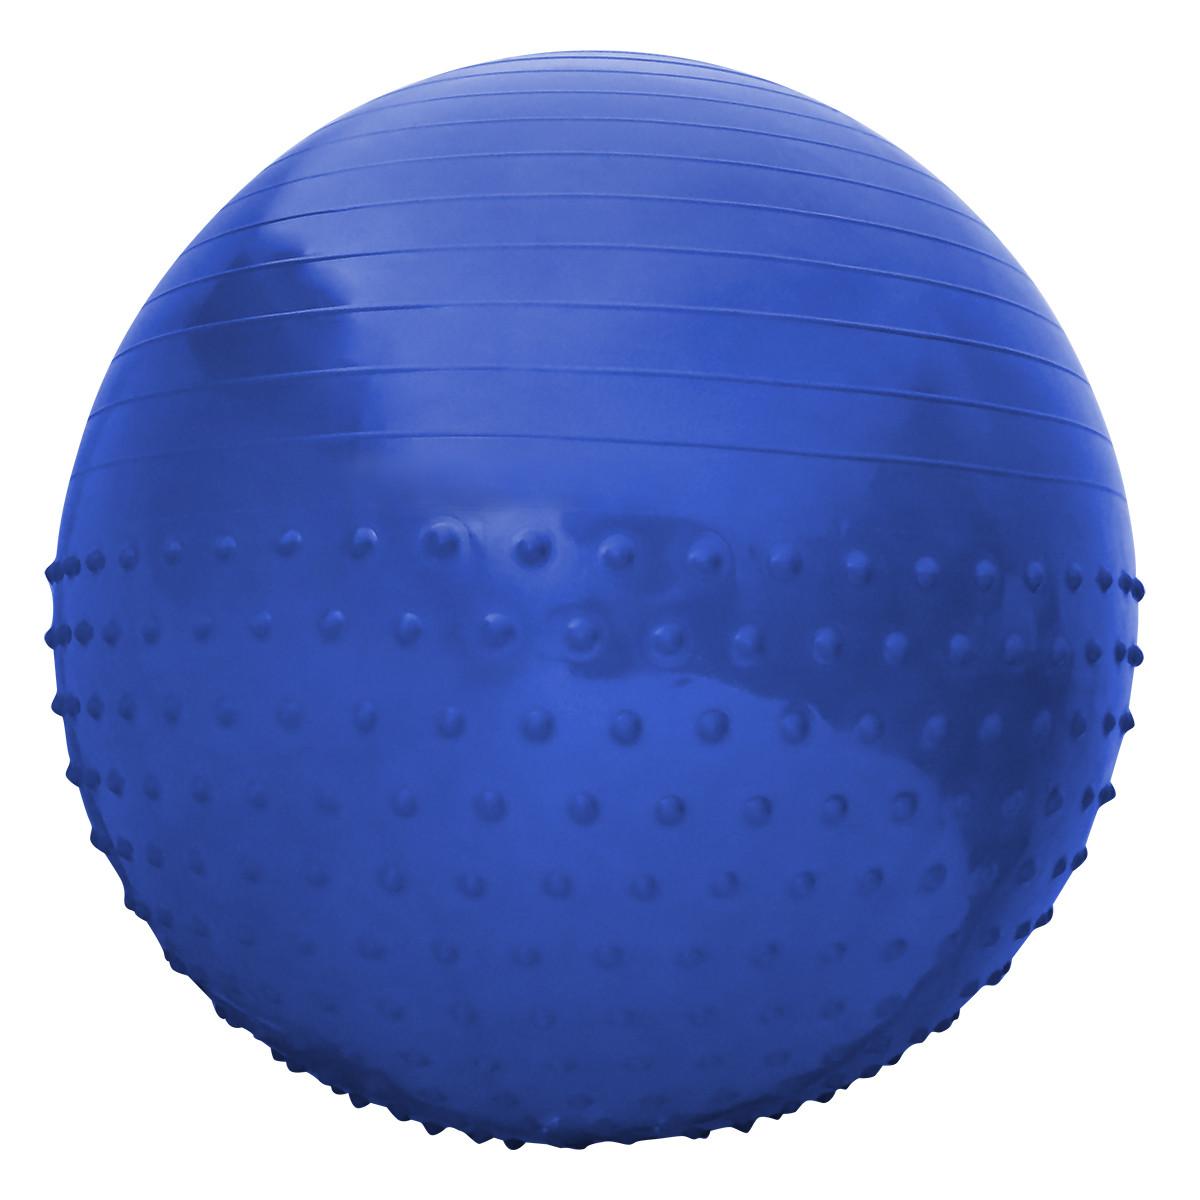 М'яч для фітнесу (фітбол) полумассажний SportVida 55 см Anti-Burst SV-HK0290 Blue